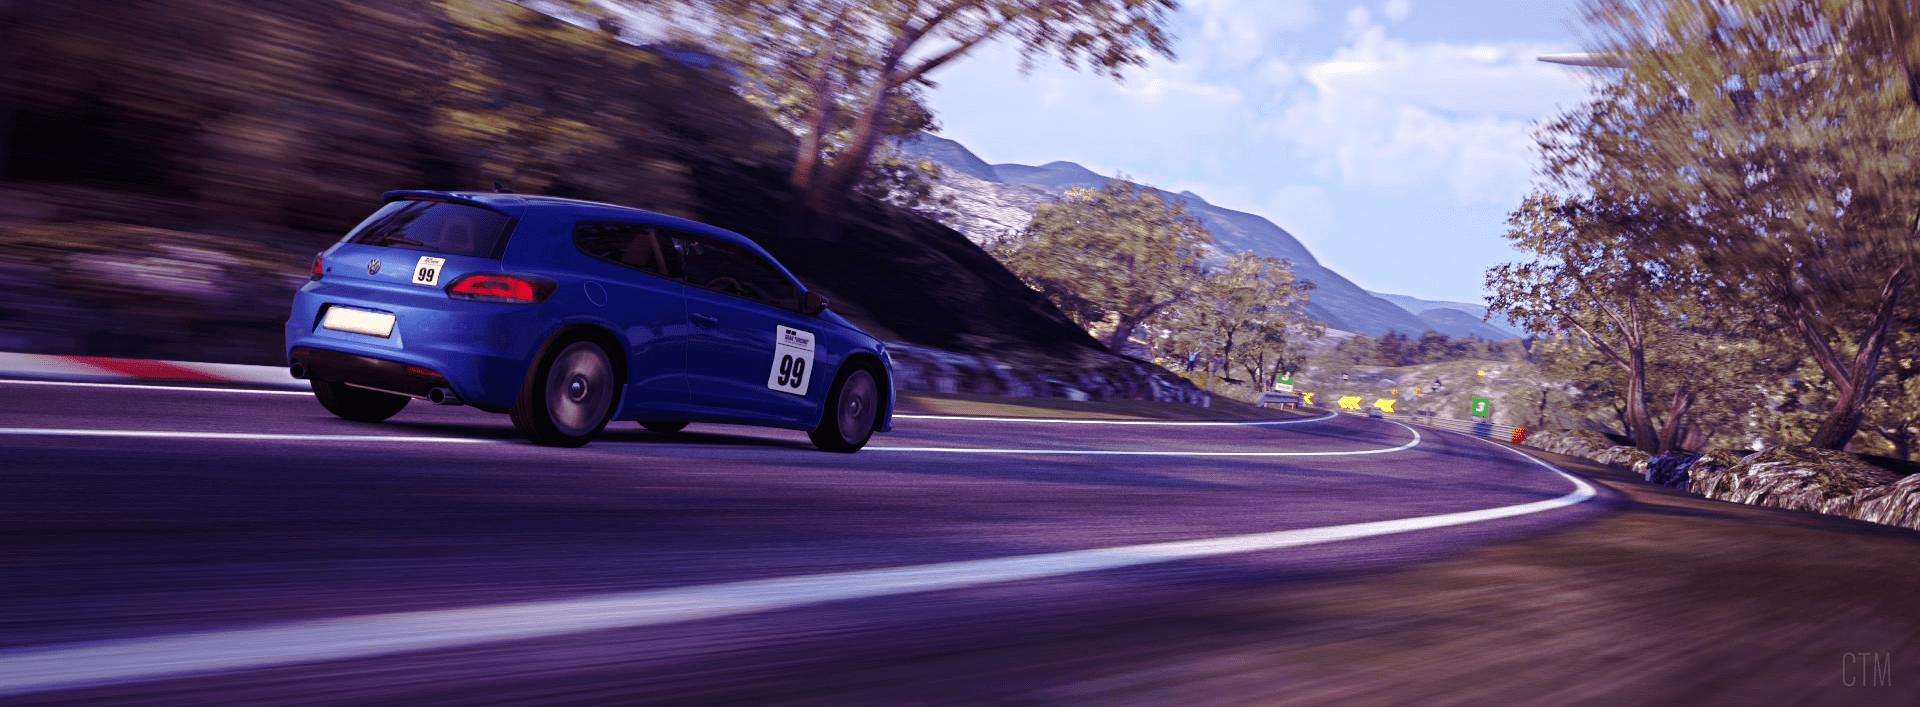 Circuito de la Sierra - Time Rally.png